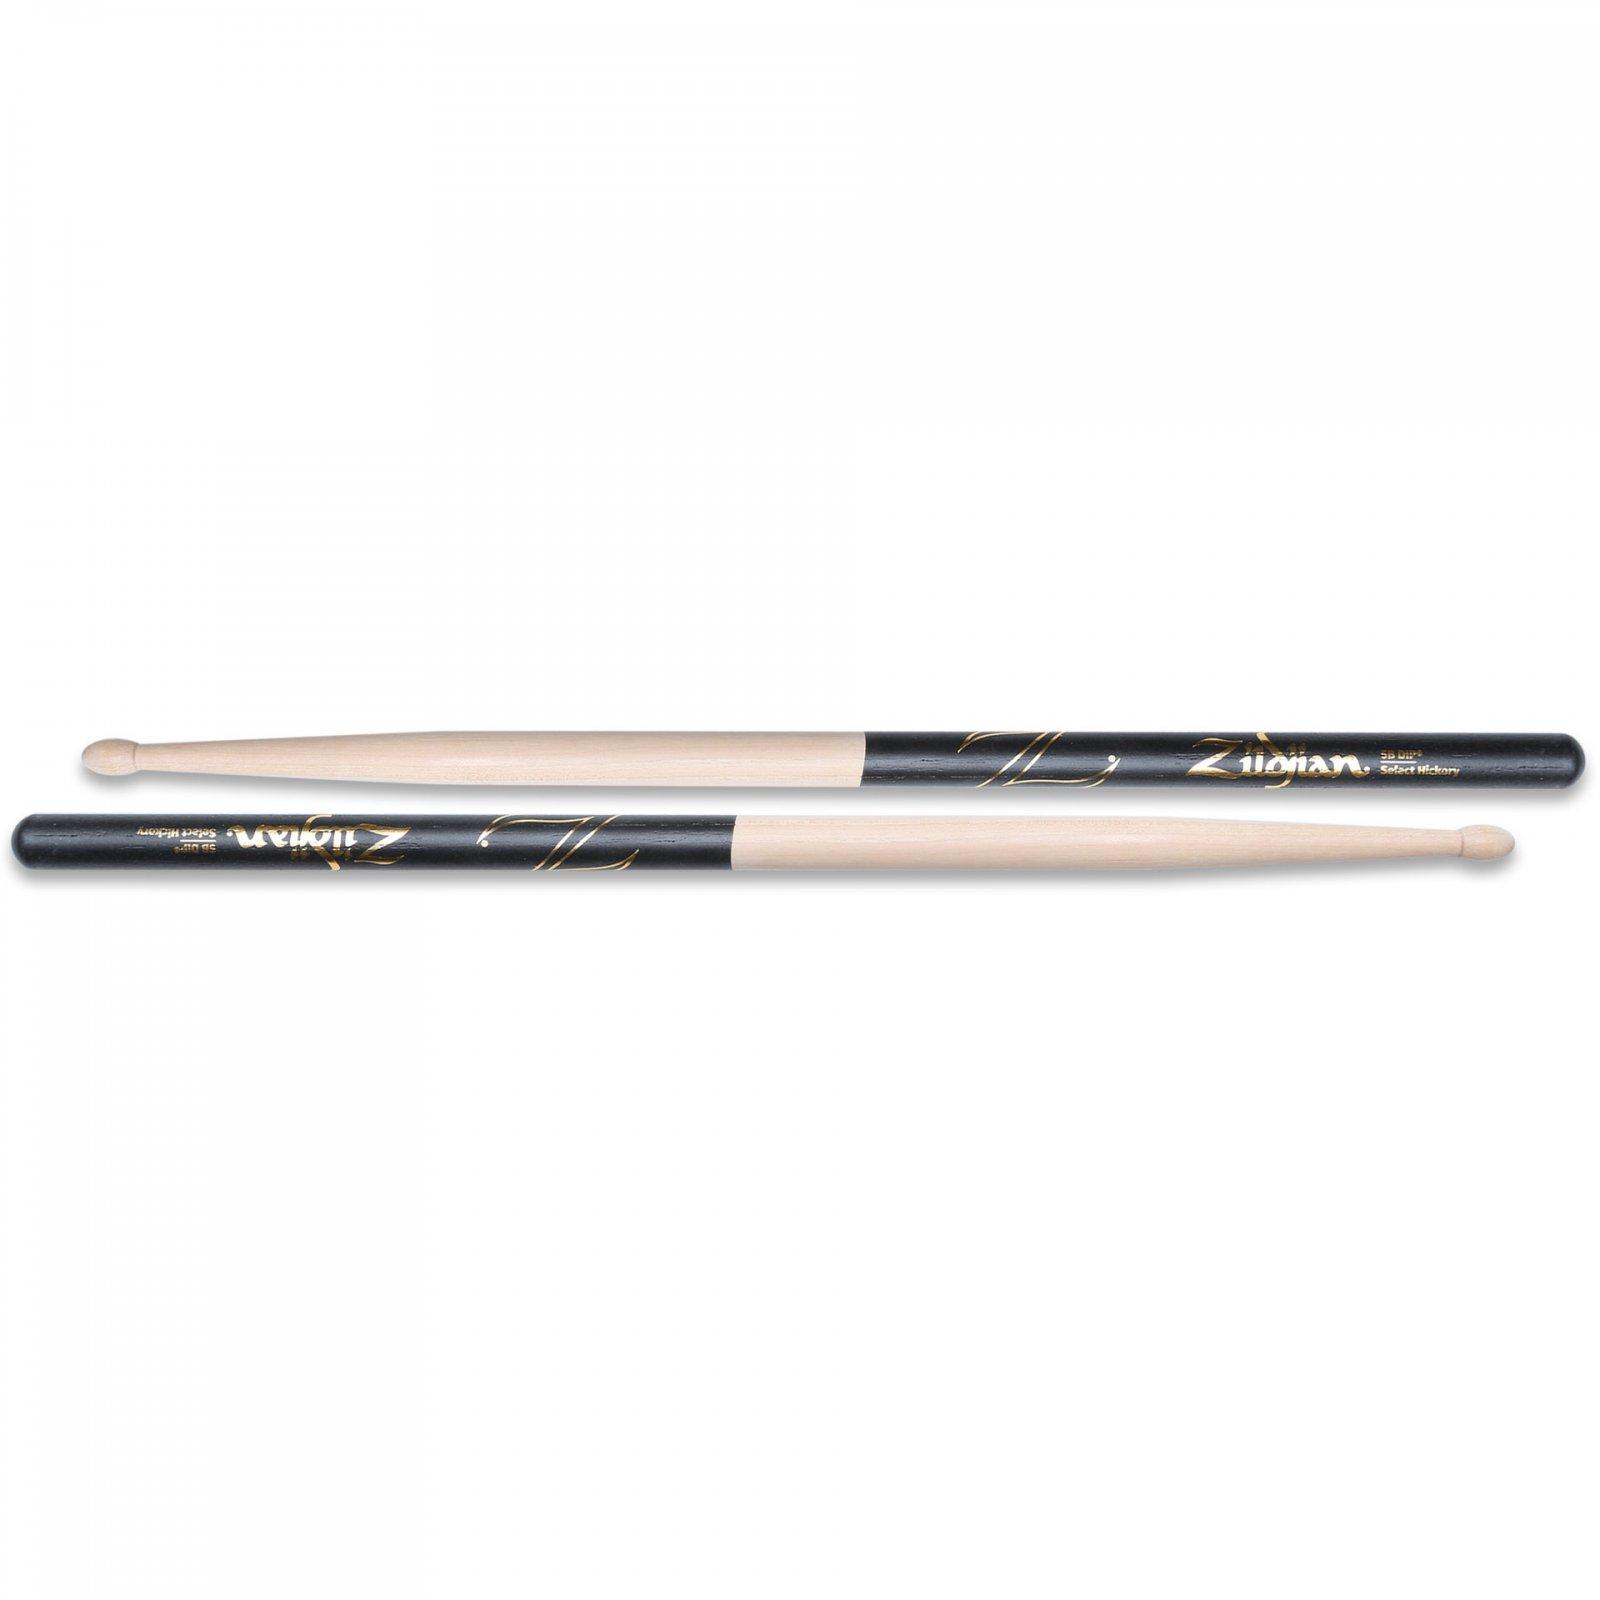 Zildjian 5B Dip Hickory Drum Sticks - Wood Tip